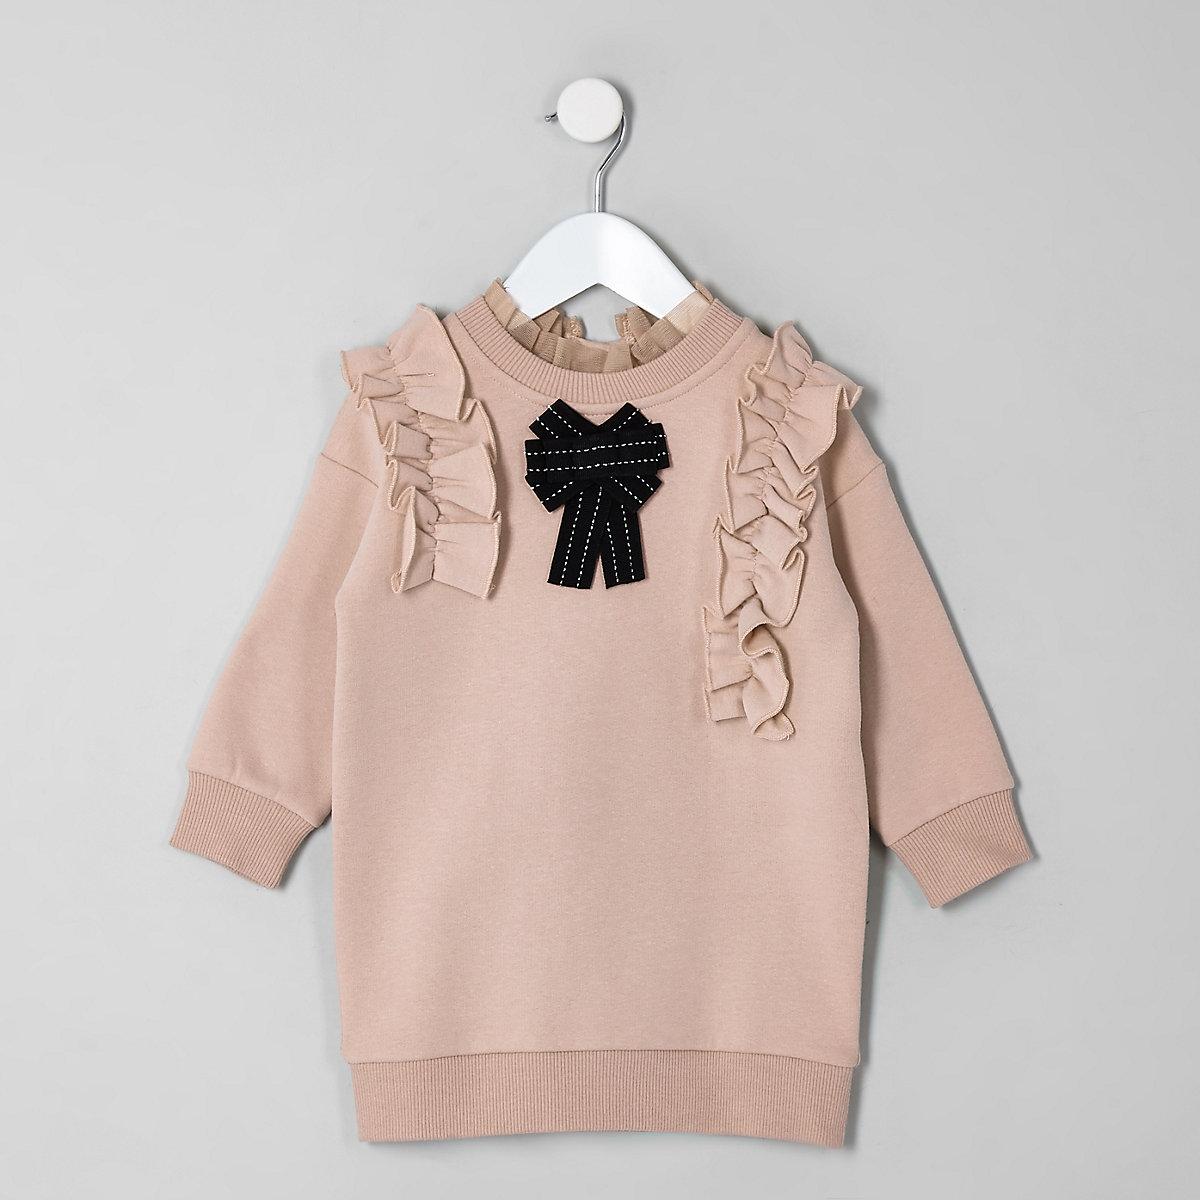 Mini girls brown bow sweater dress